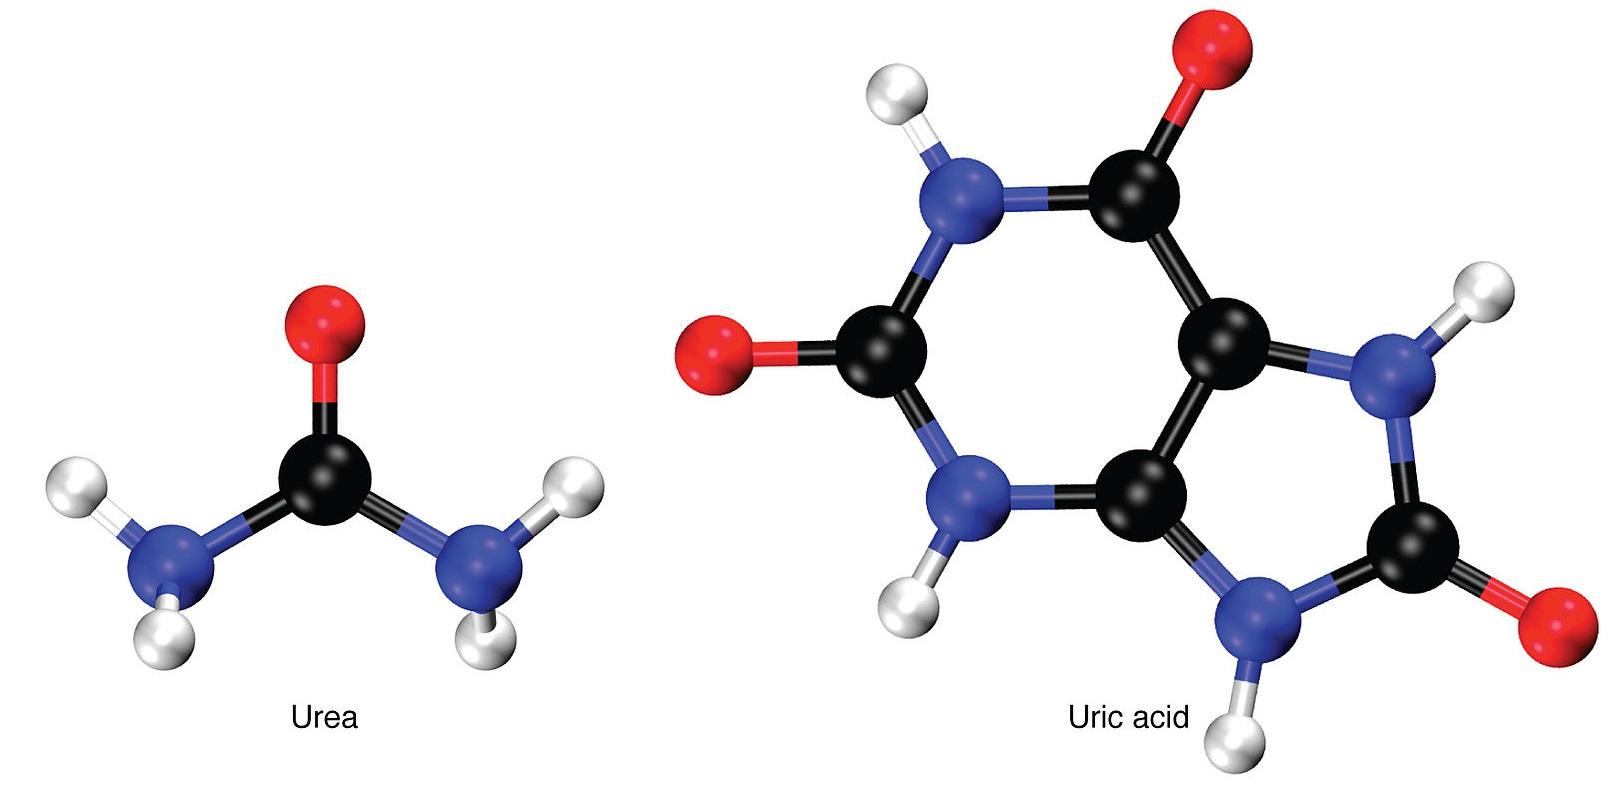 تفاوت بین اوره و اوریک اسید